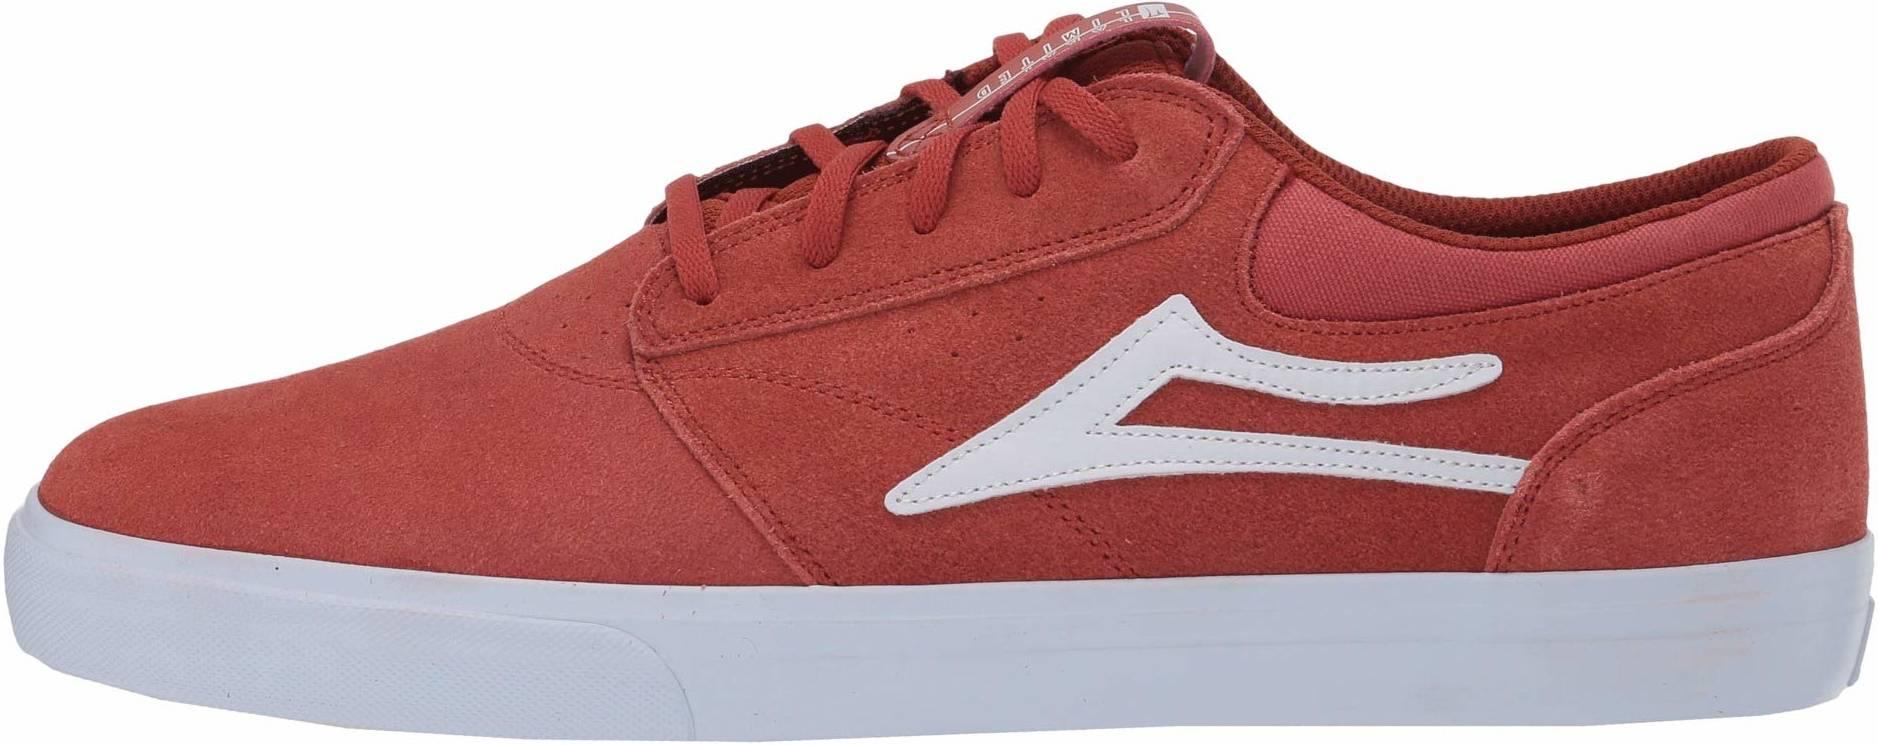 Lakai Footwear Mens Griffin Skate Shoe